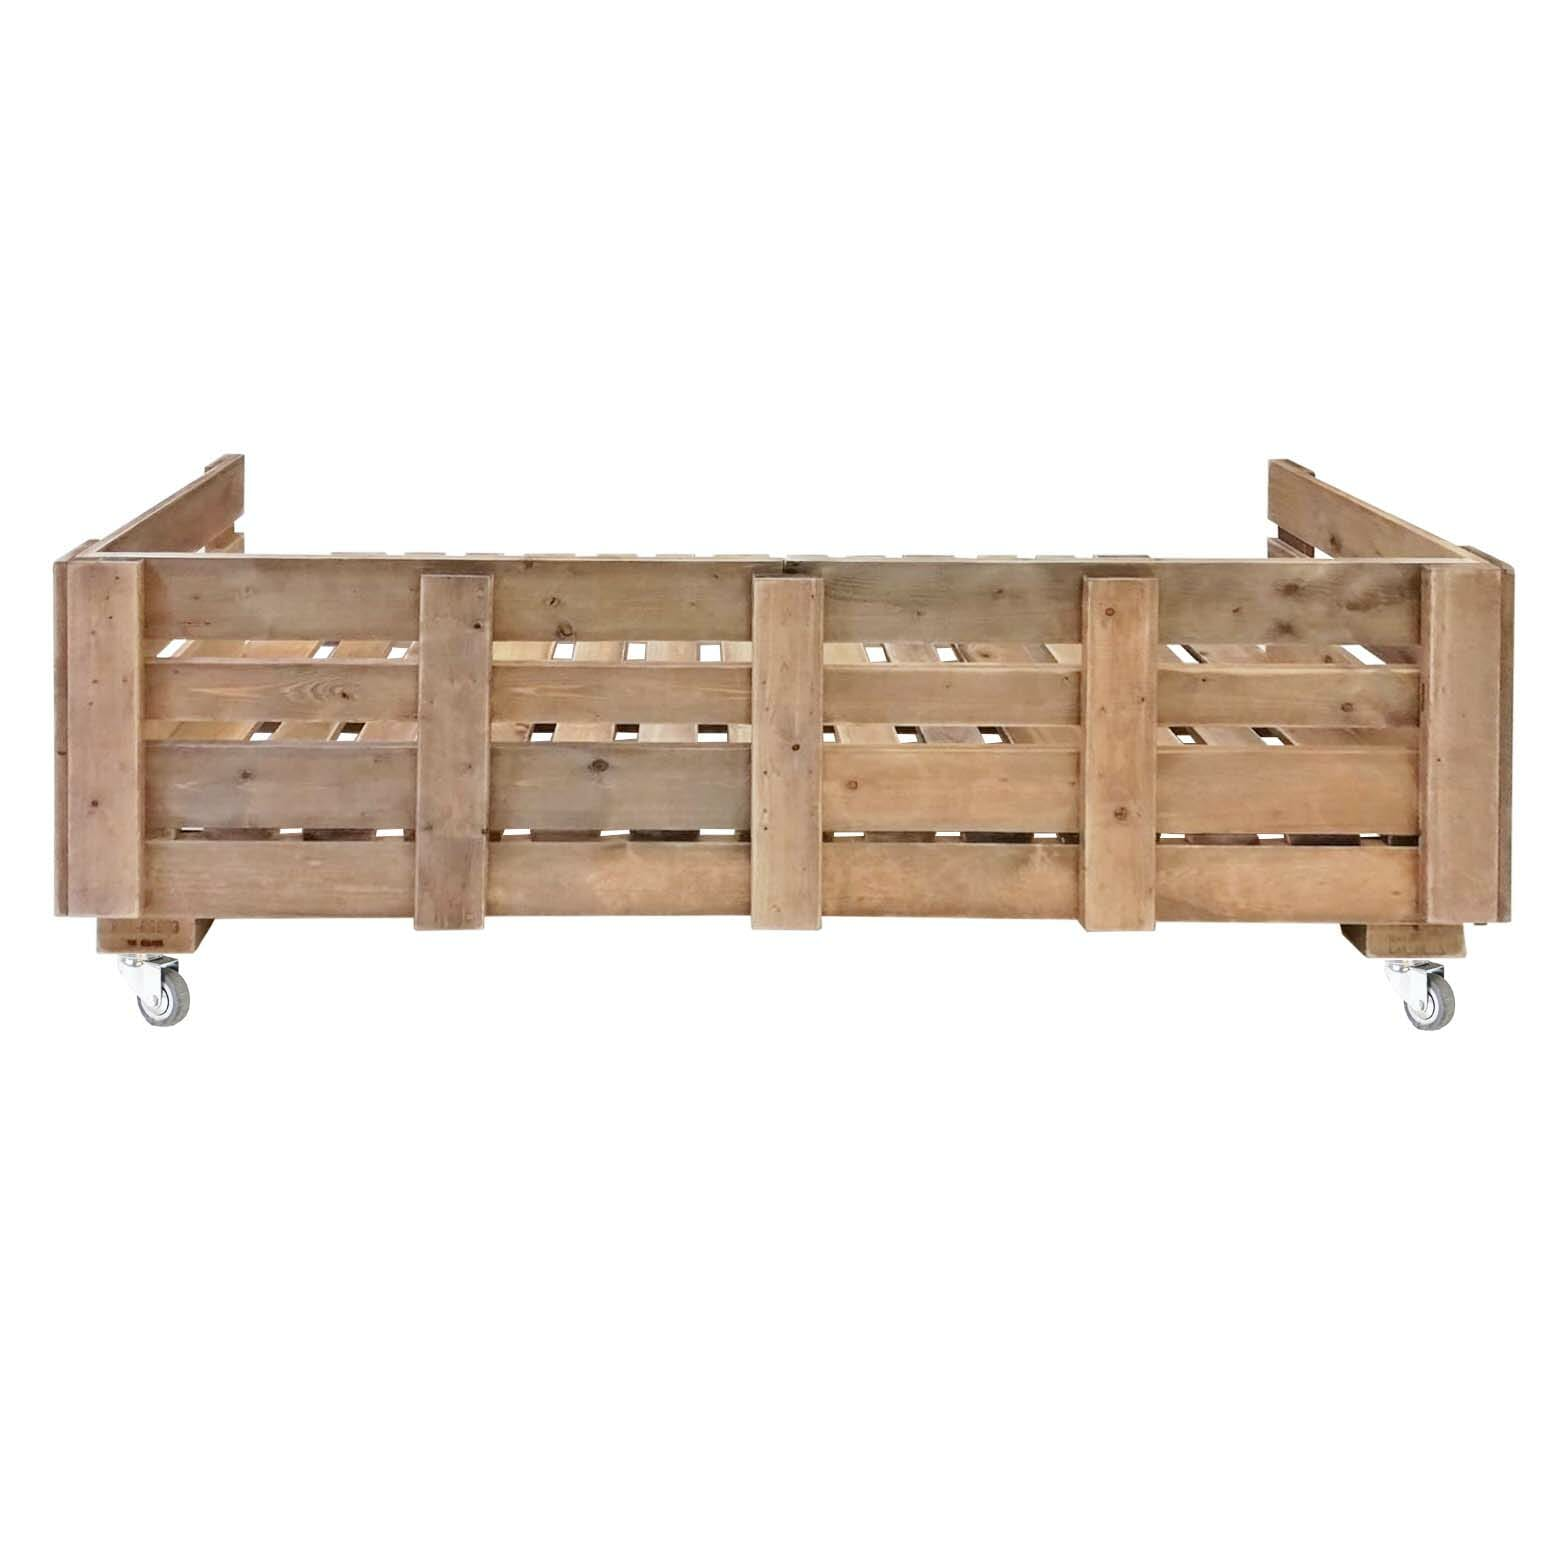 palettensofa komplett angebot - couch | palettenmÖbel shop